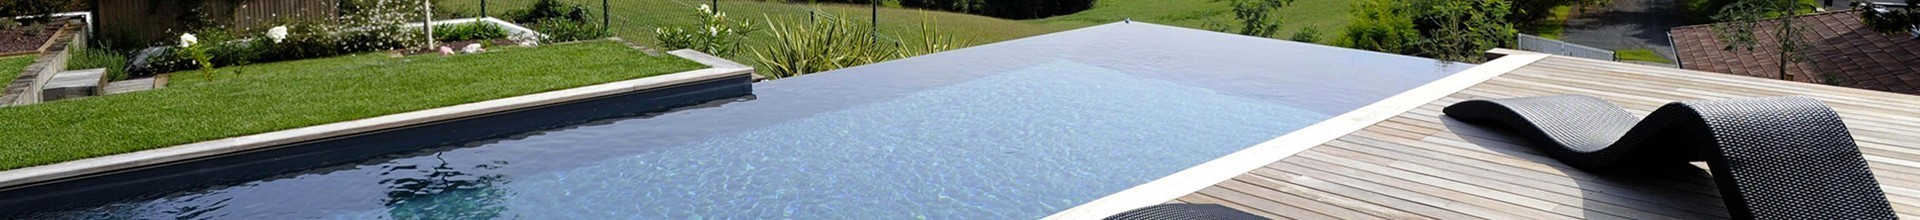 Votre future piscine conteneur sur Suisse Lugano_TI , les avantages